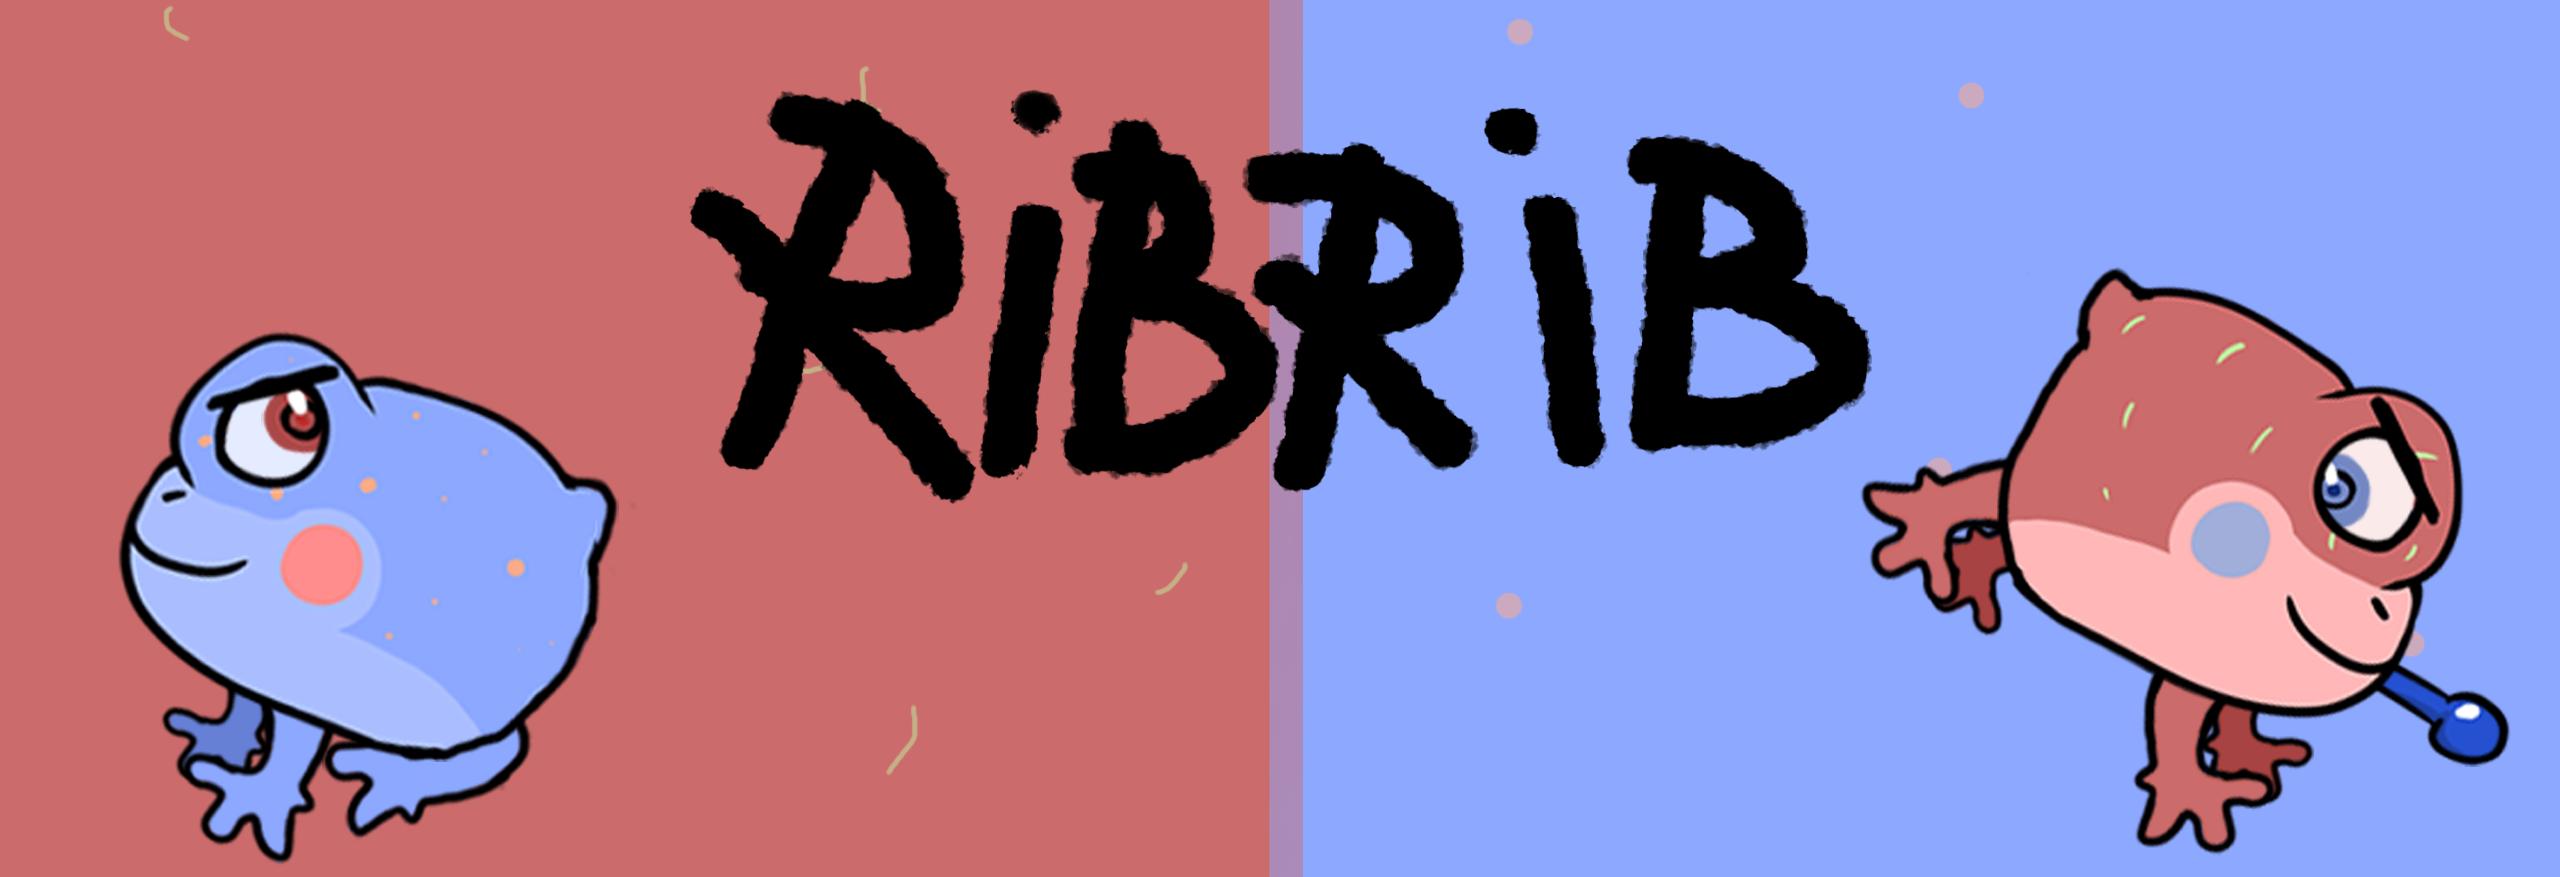 RibRib